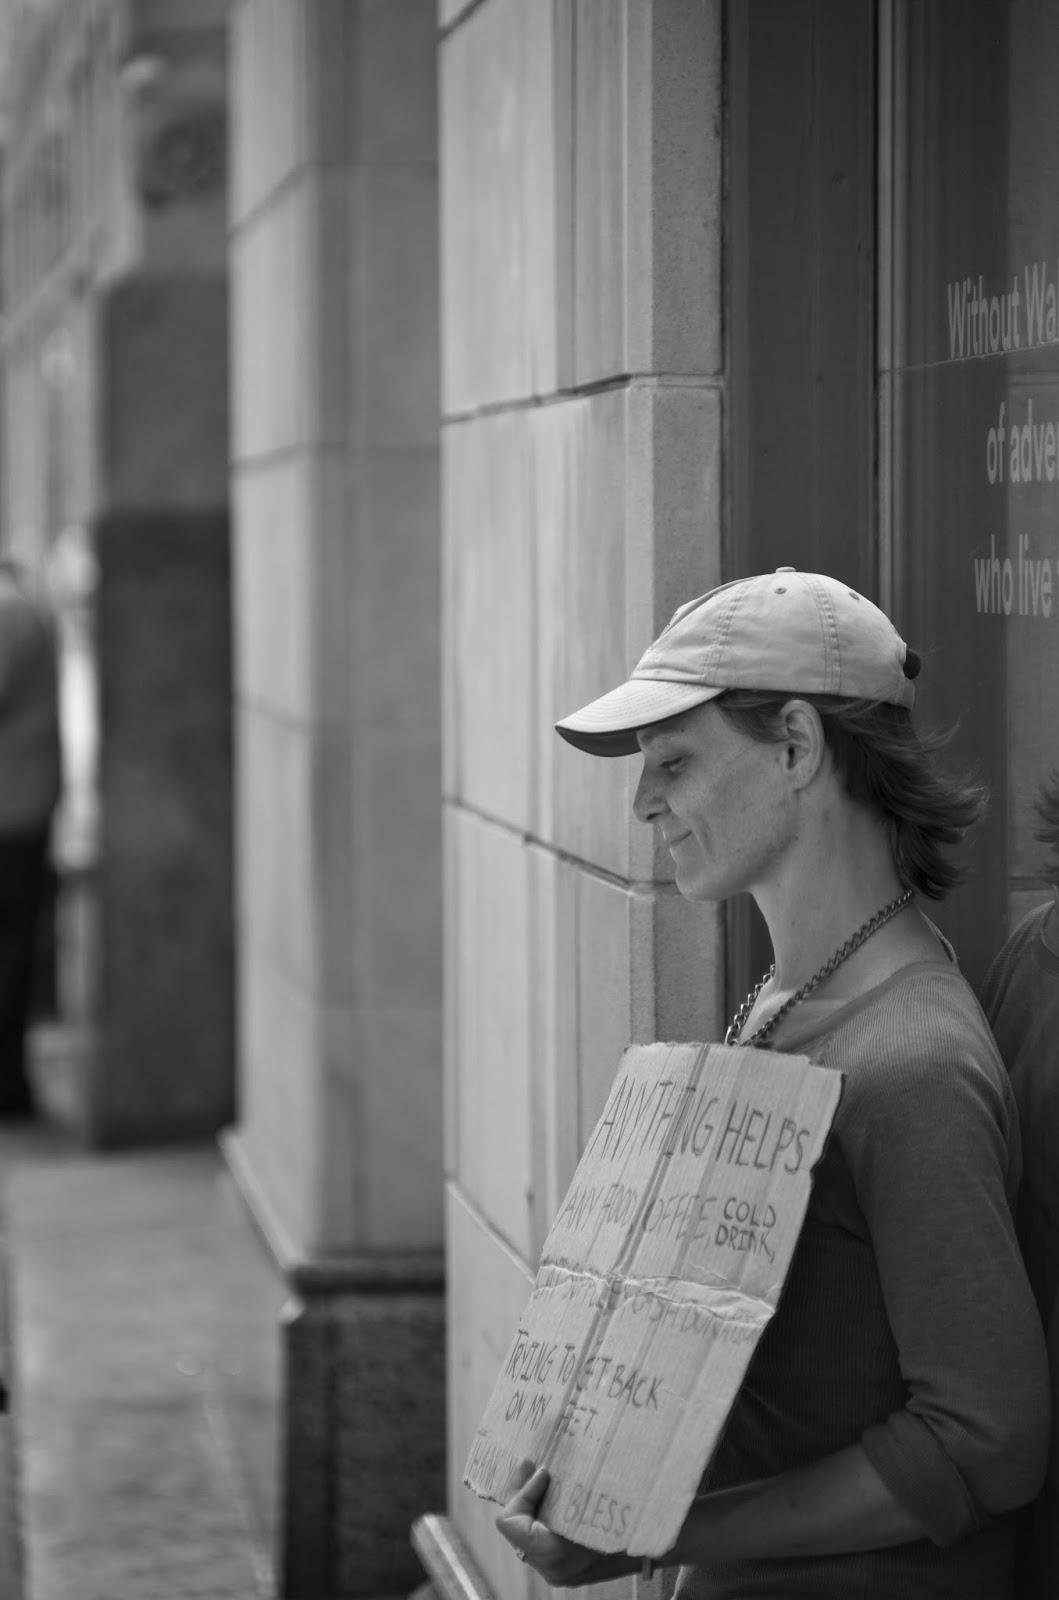 https://www.flickr.com/photos/jaywesphotos/14728317856/in/photostream/